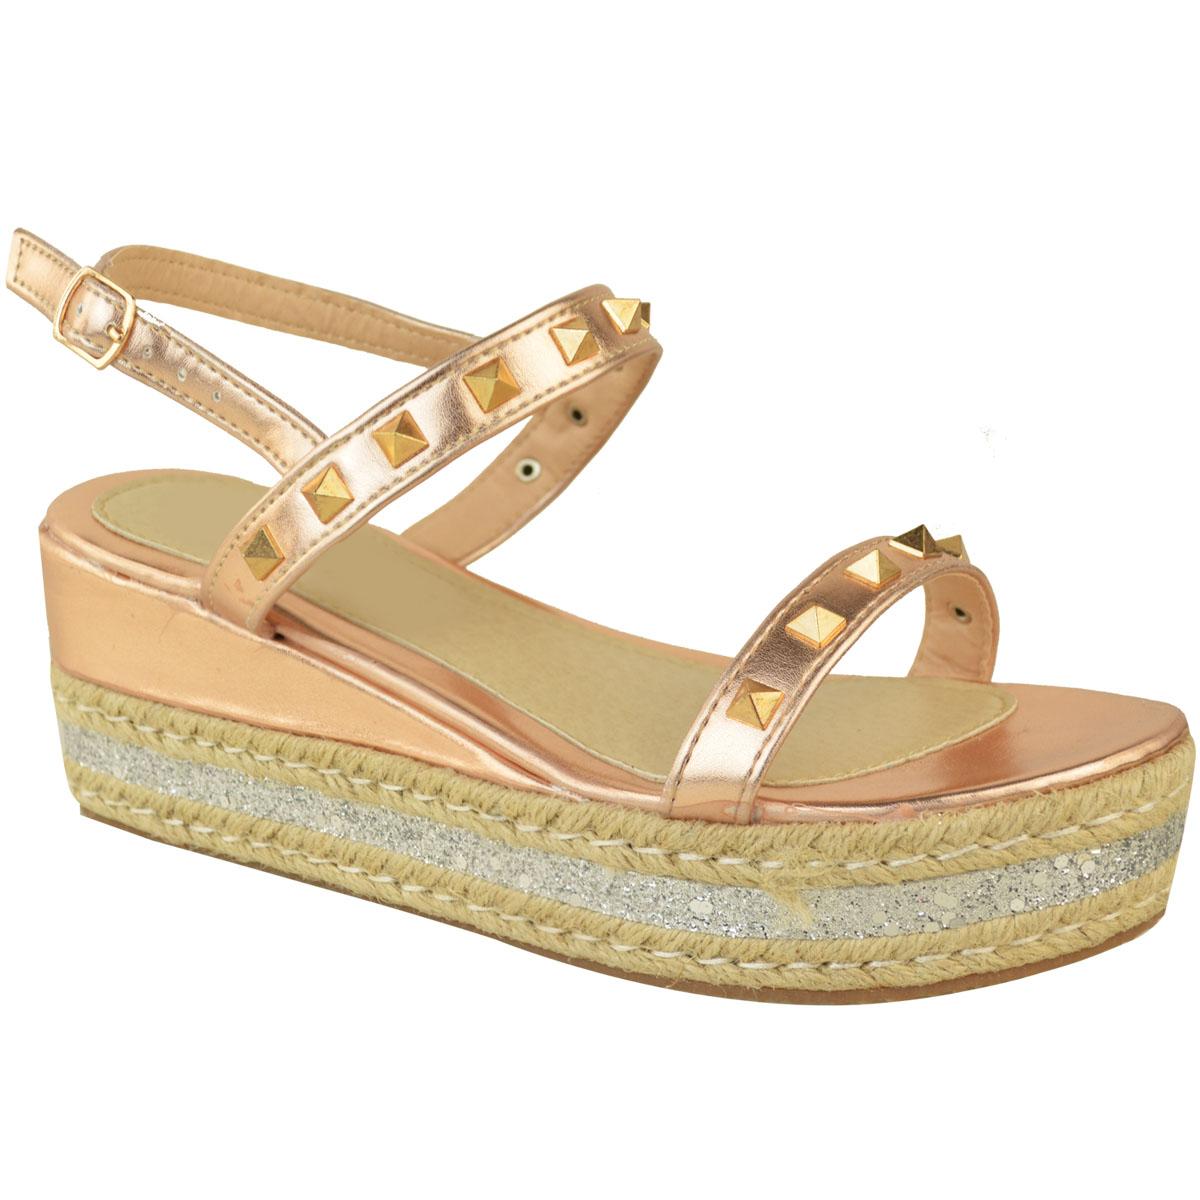 21dc94903fe New Womens Espadrilles Flatform Studded Sandals Low Heel Wedges ...